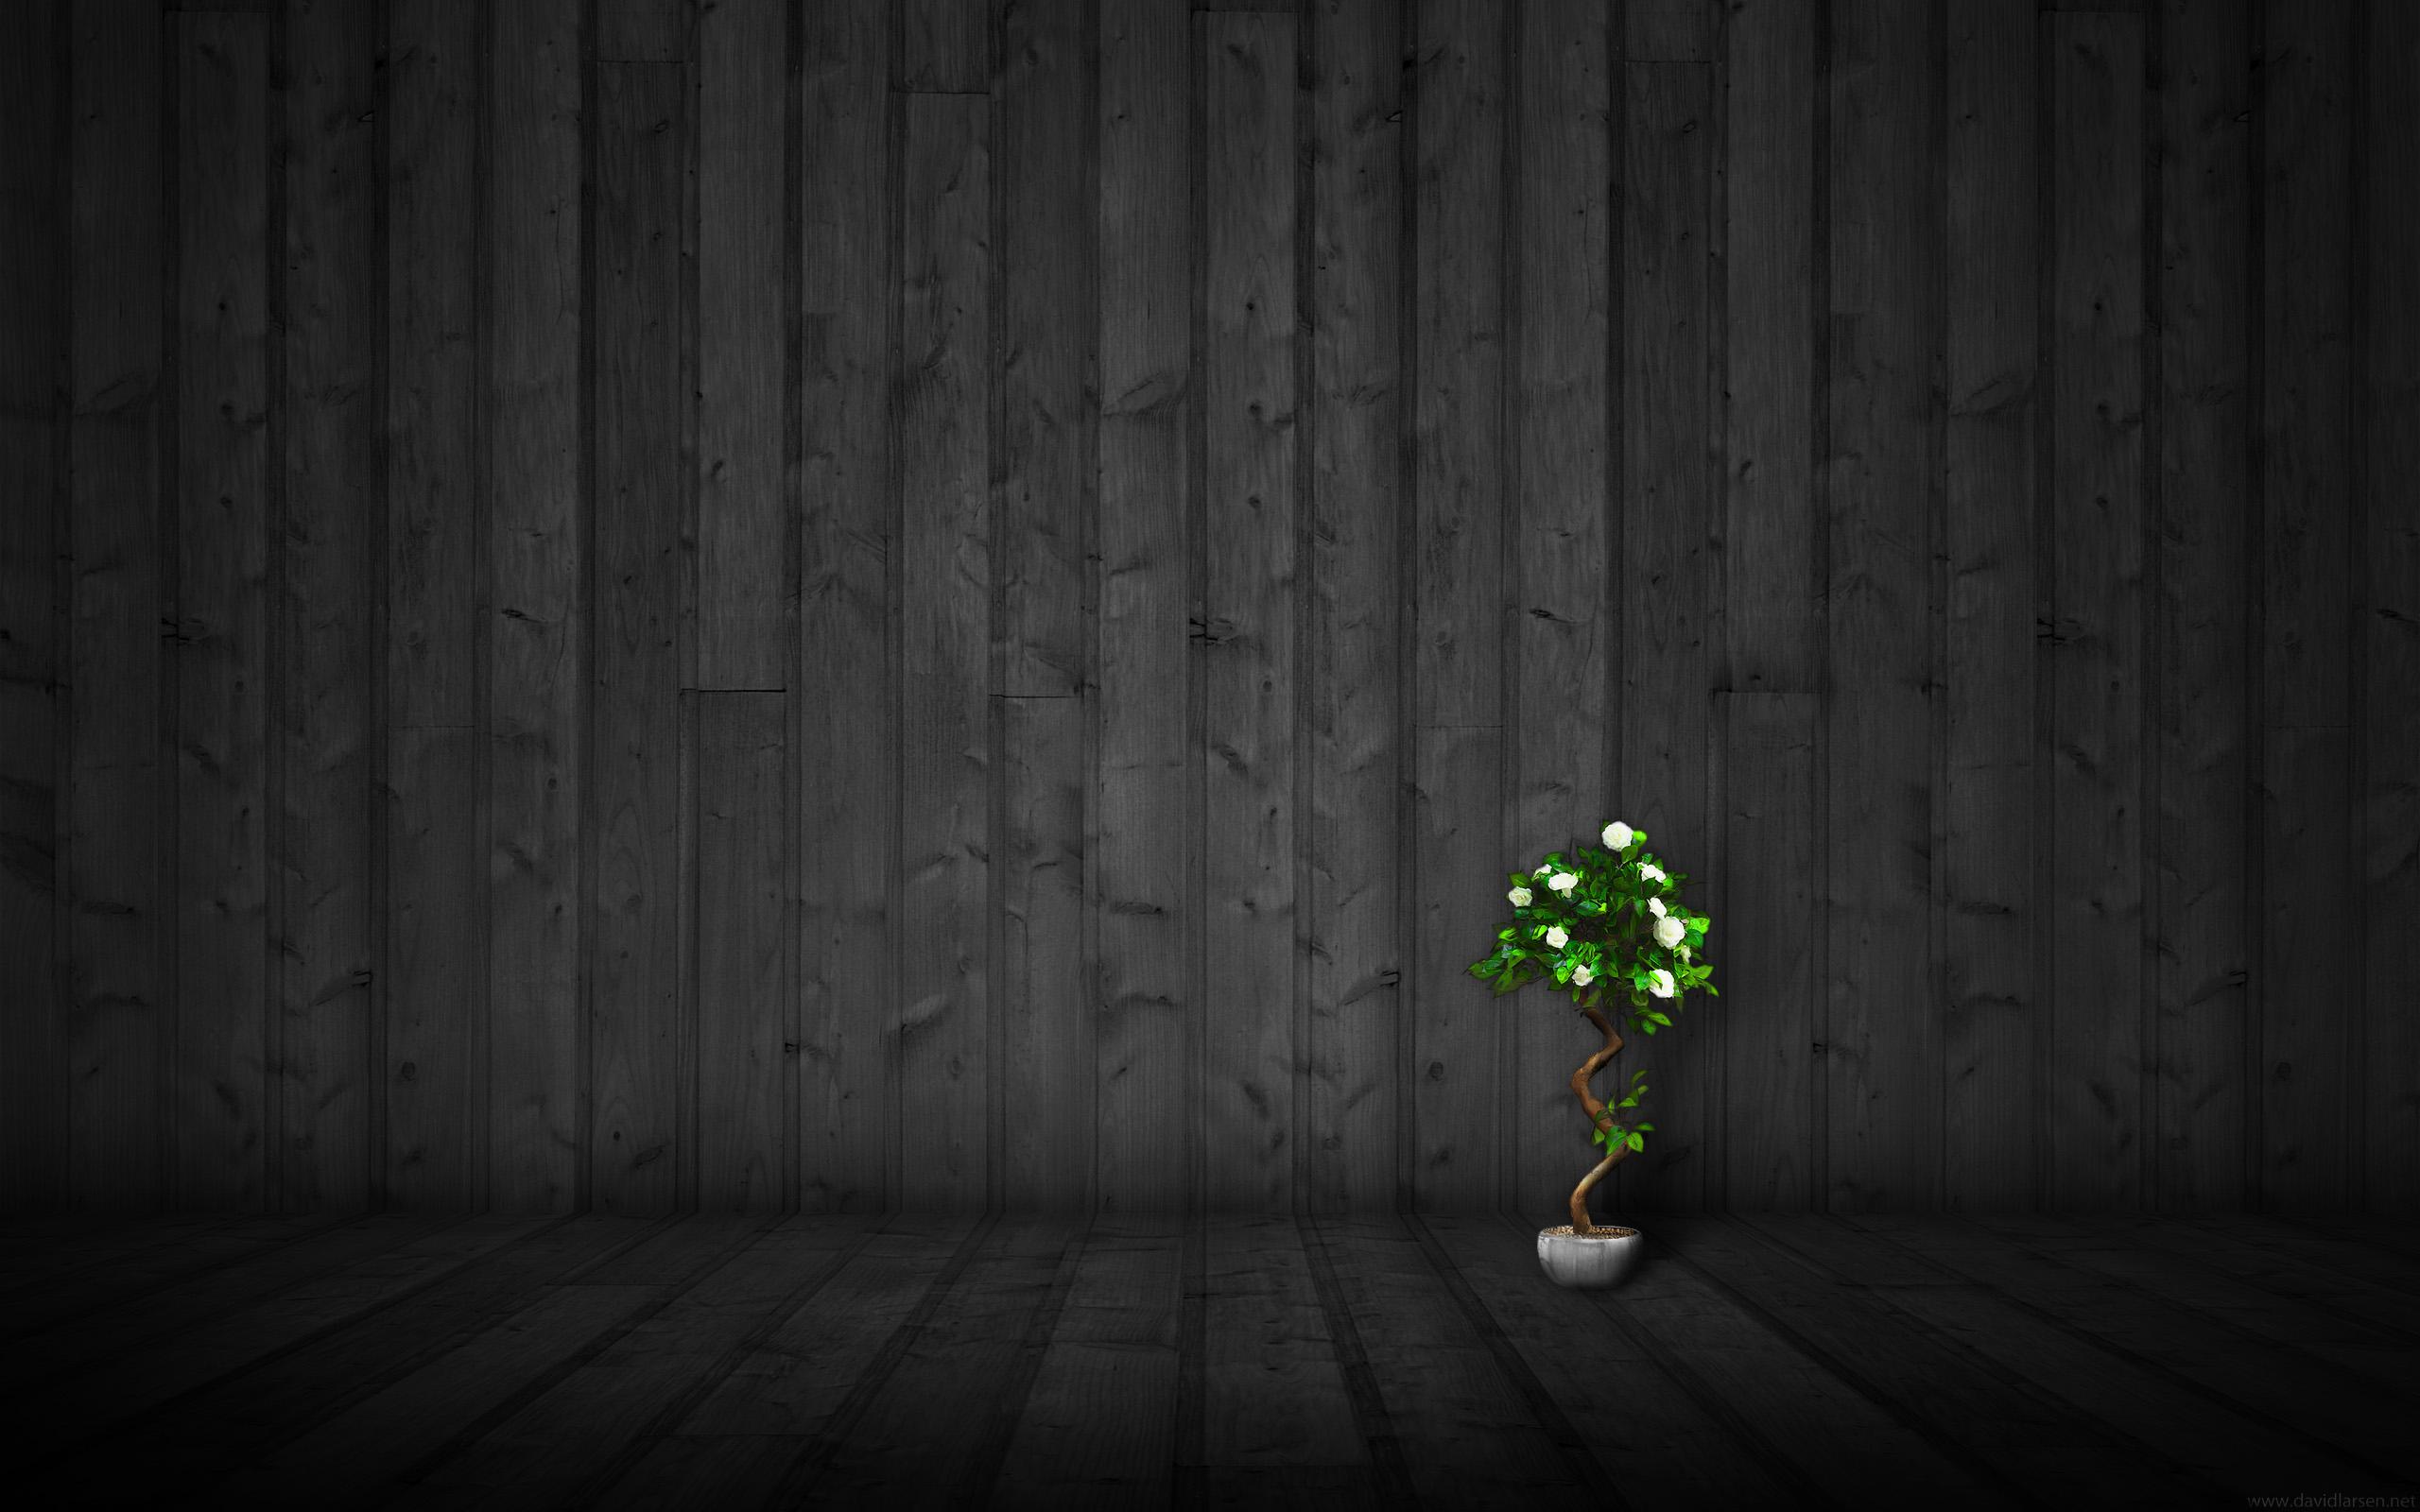 Theme Bin Blog Archive Dark Wood 2 HD Wallpaper 2560x1600